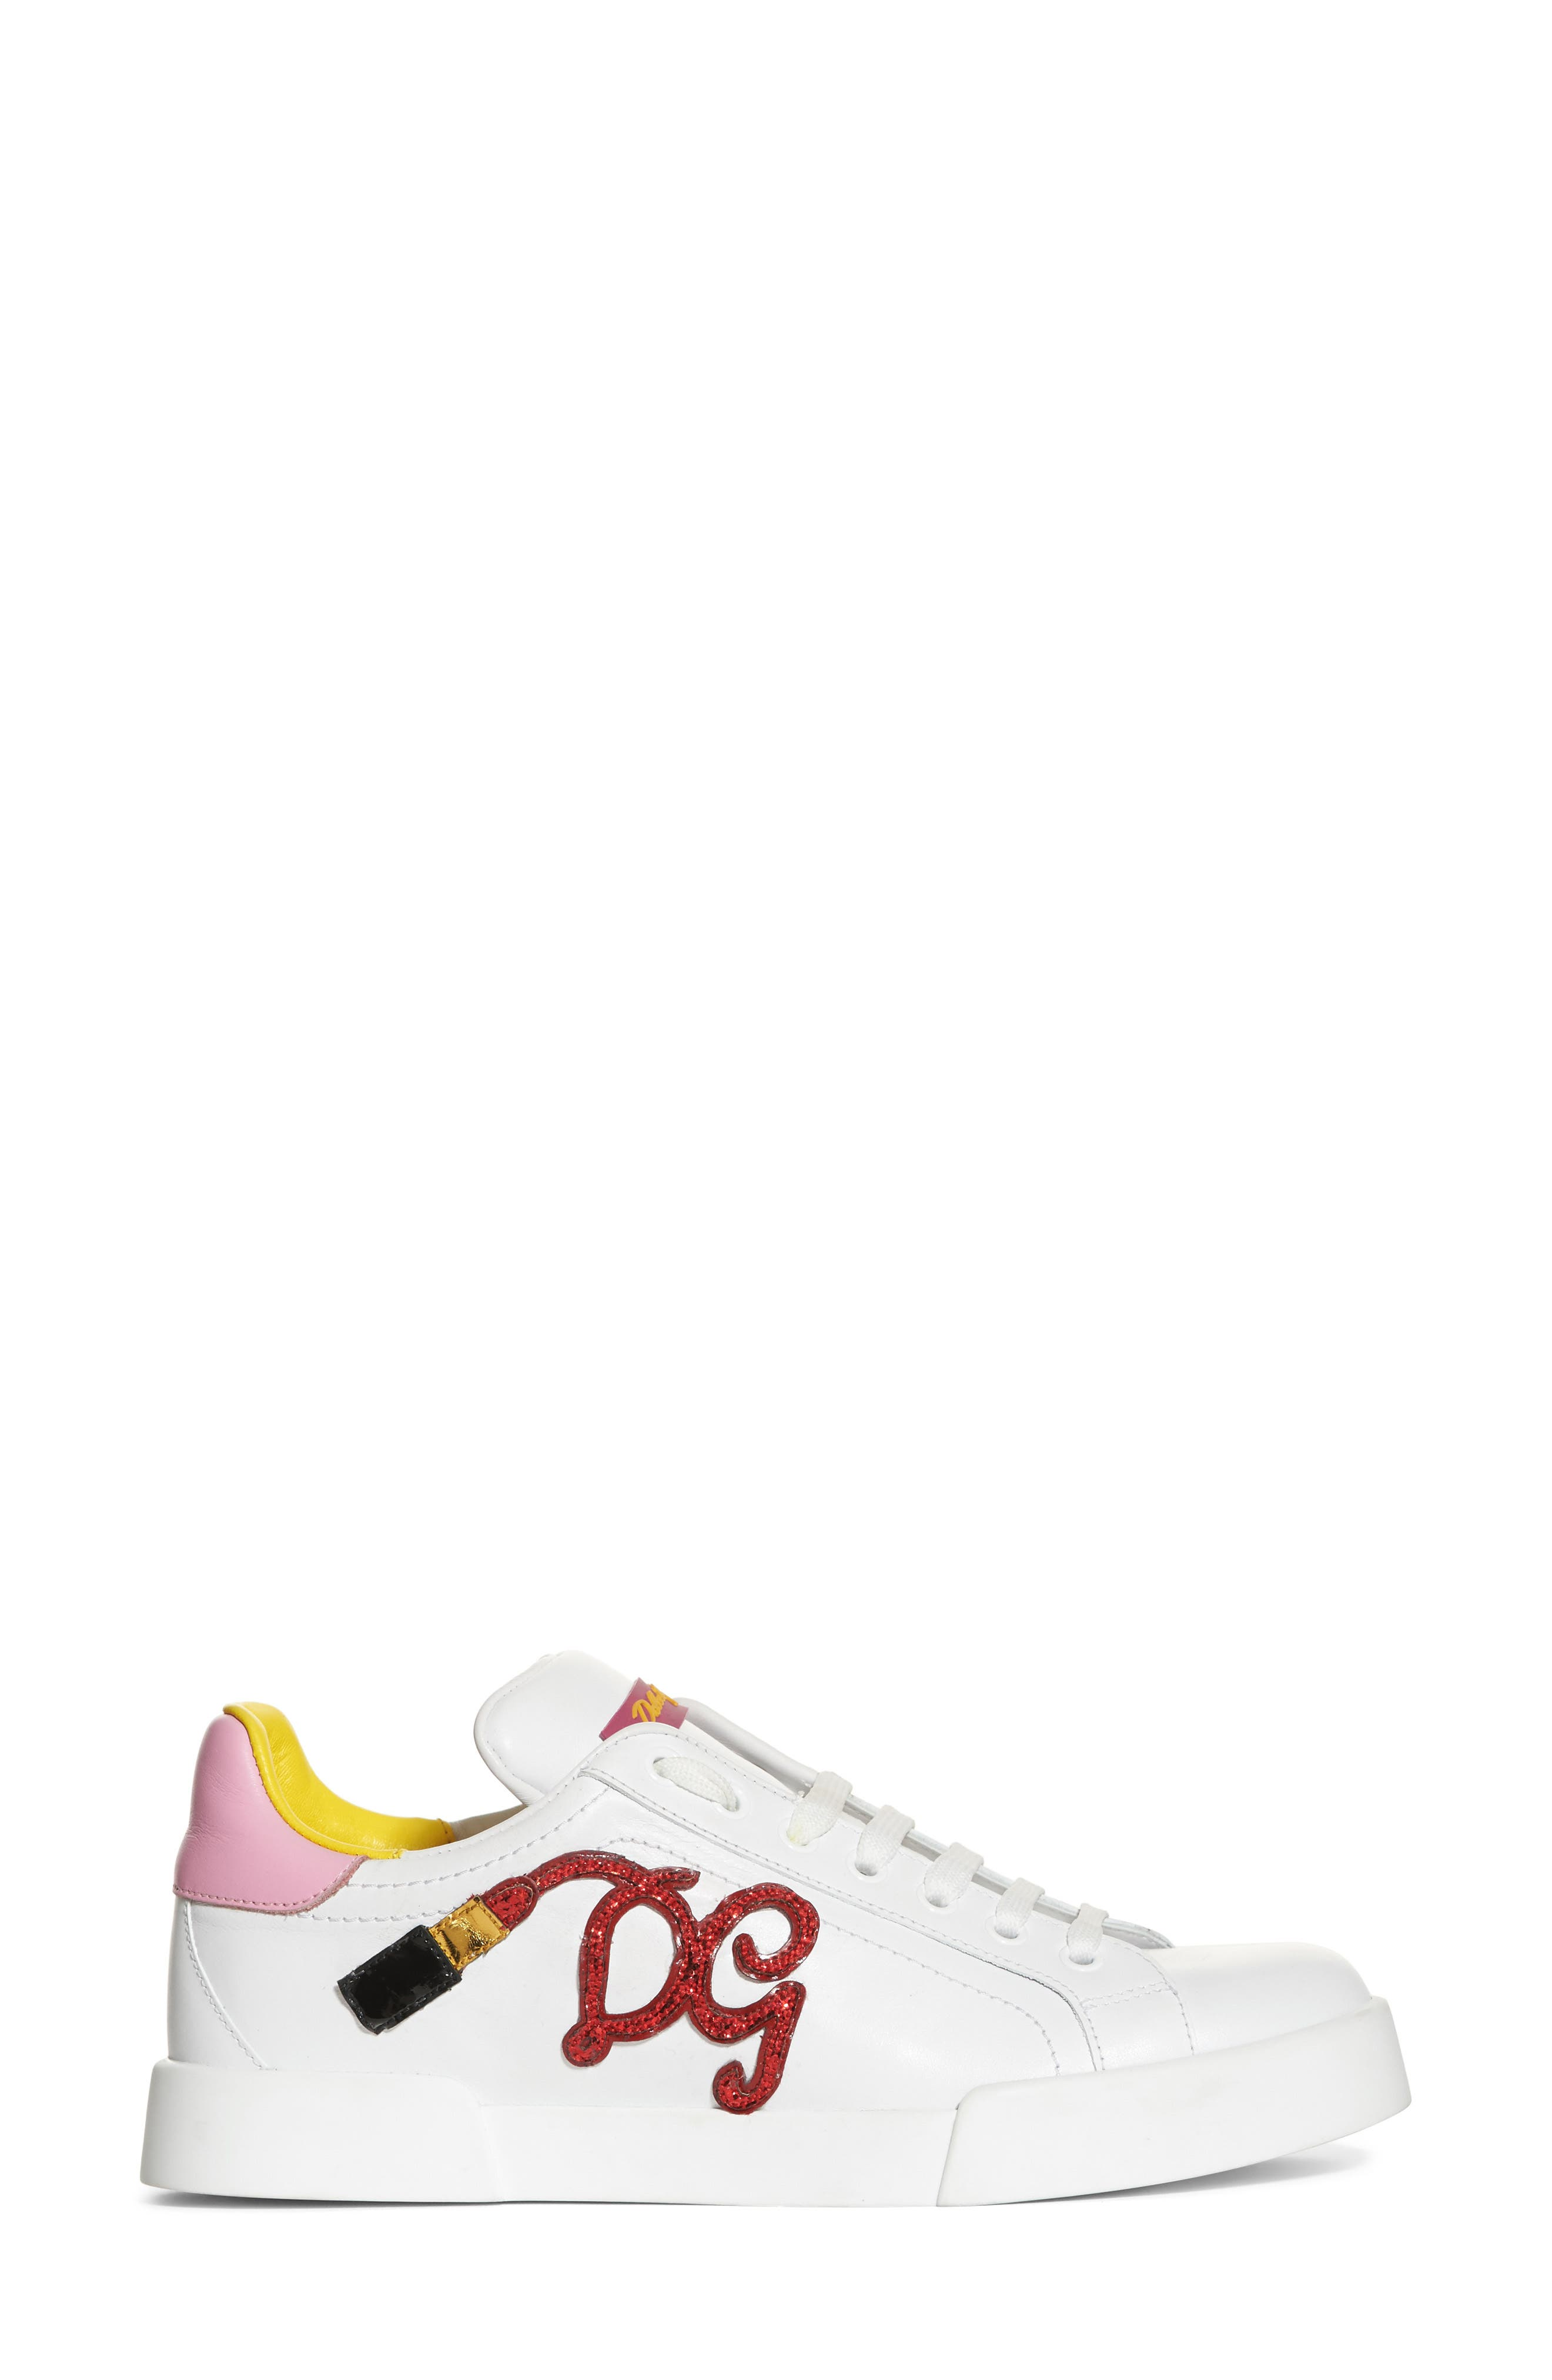 Lipstick Sneaker,                             Alternate thumbnail 3, color,                             White/ Pink